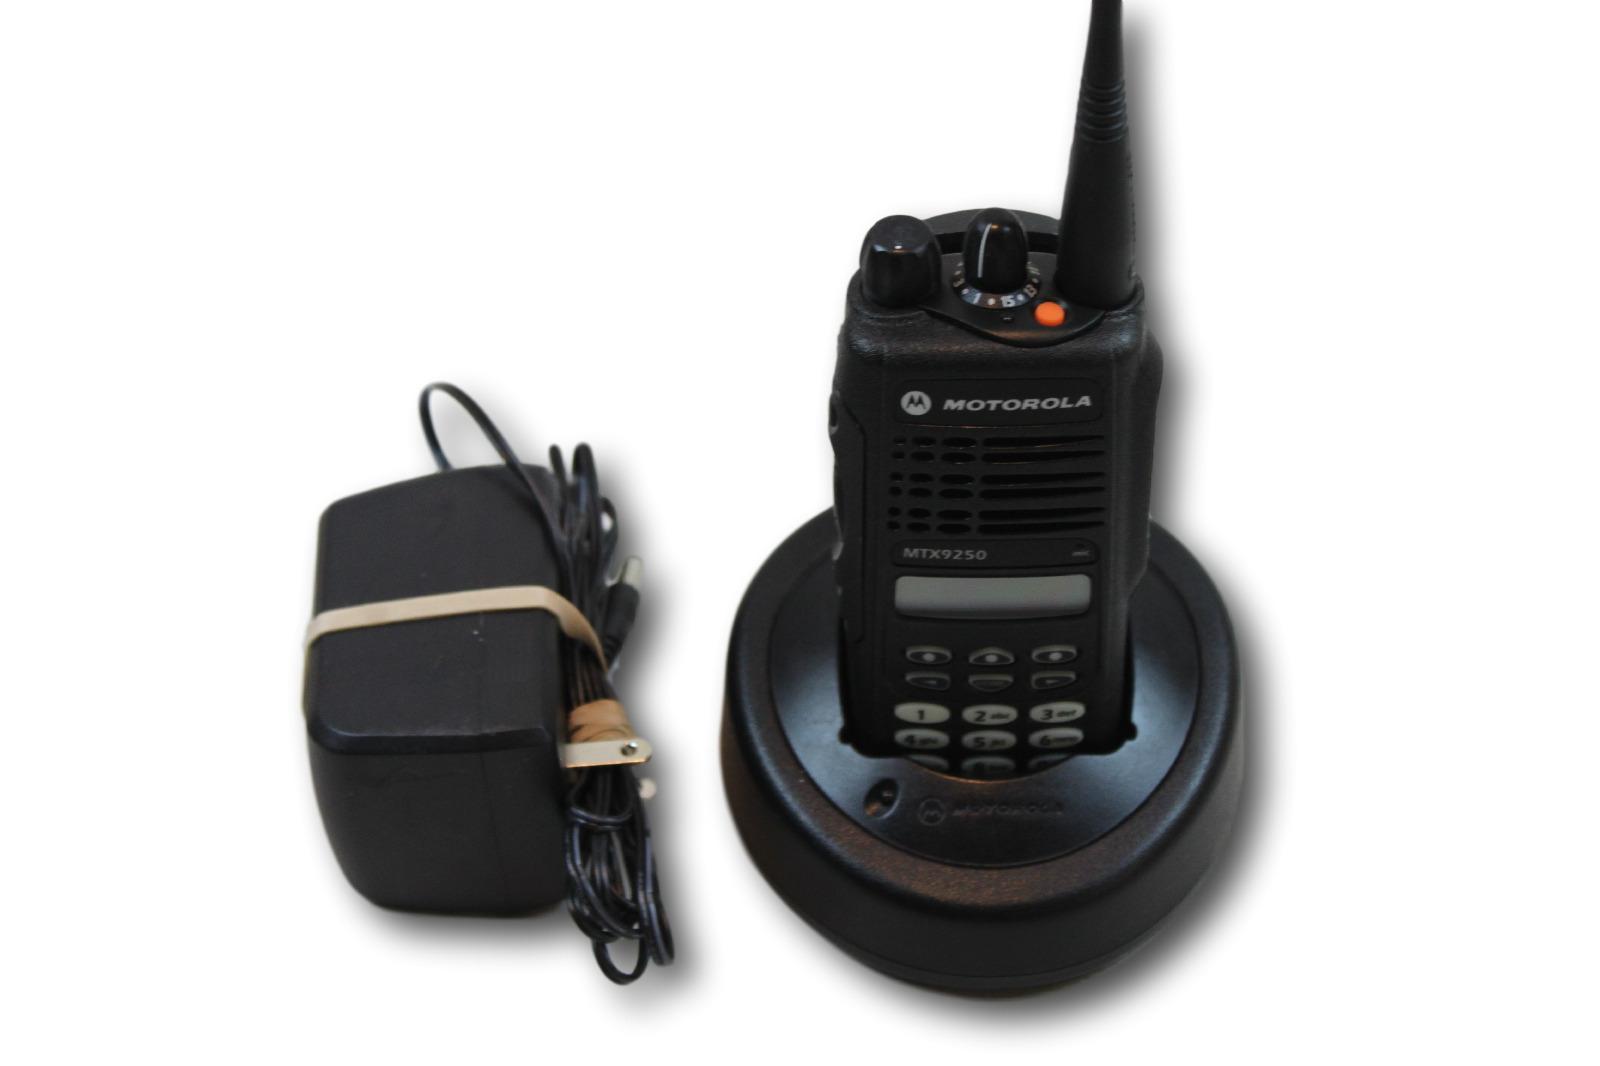 Intrinsically Safe Motorola Radios